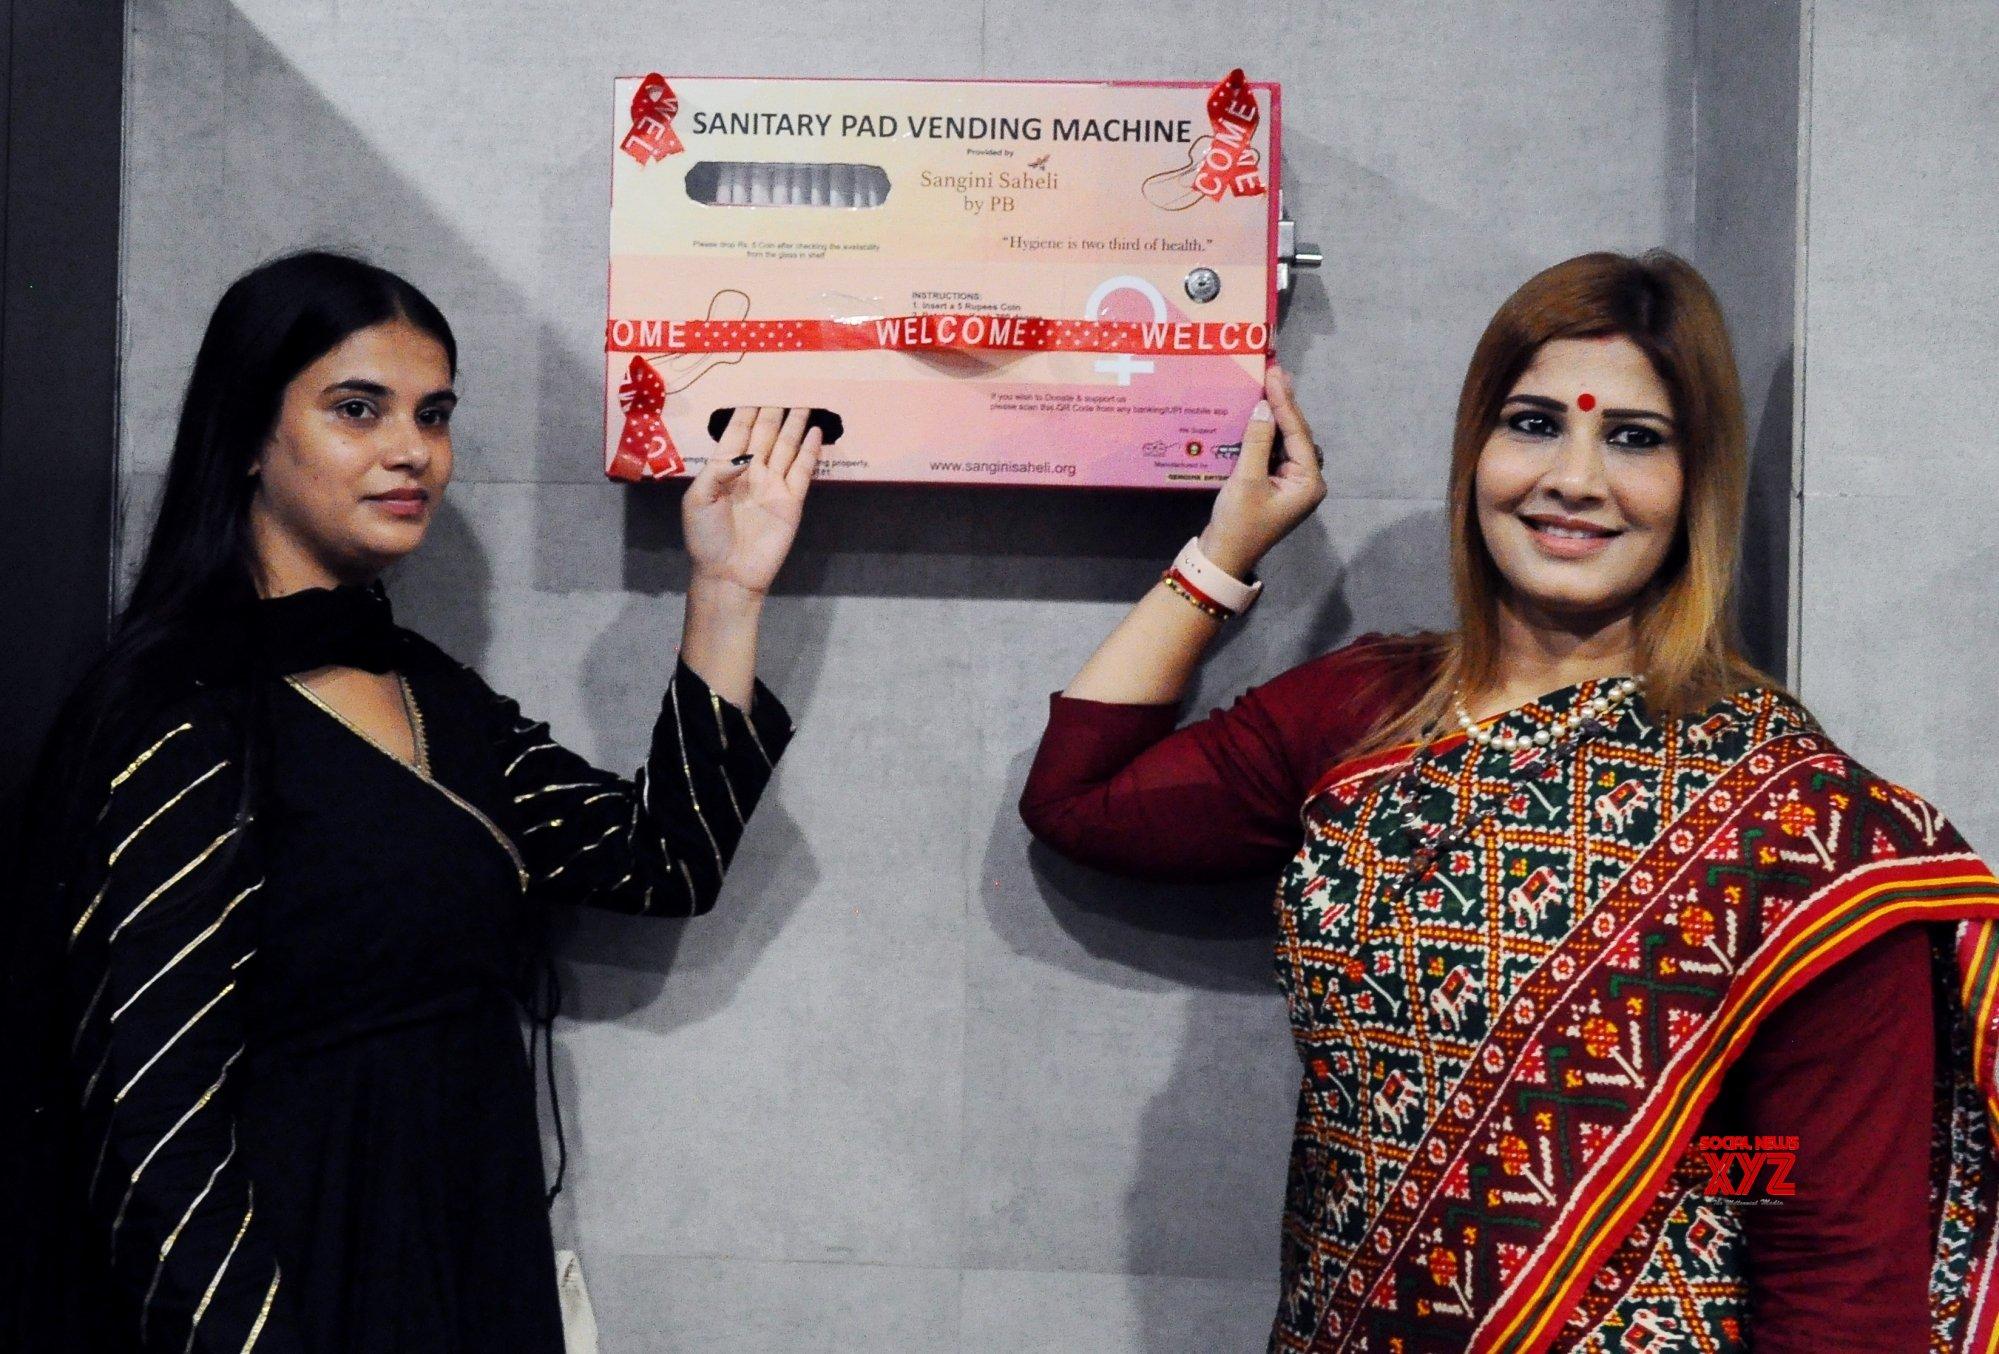 New Delhi: Sanitary Pad Vending Machine inaugurated by National President of Mahila Morcha at BJP Headquarters in New Delhi #Gallery - Social News XYZ